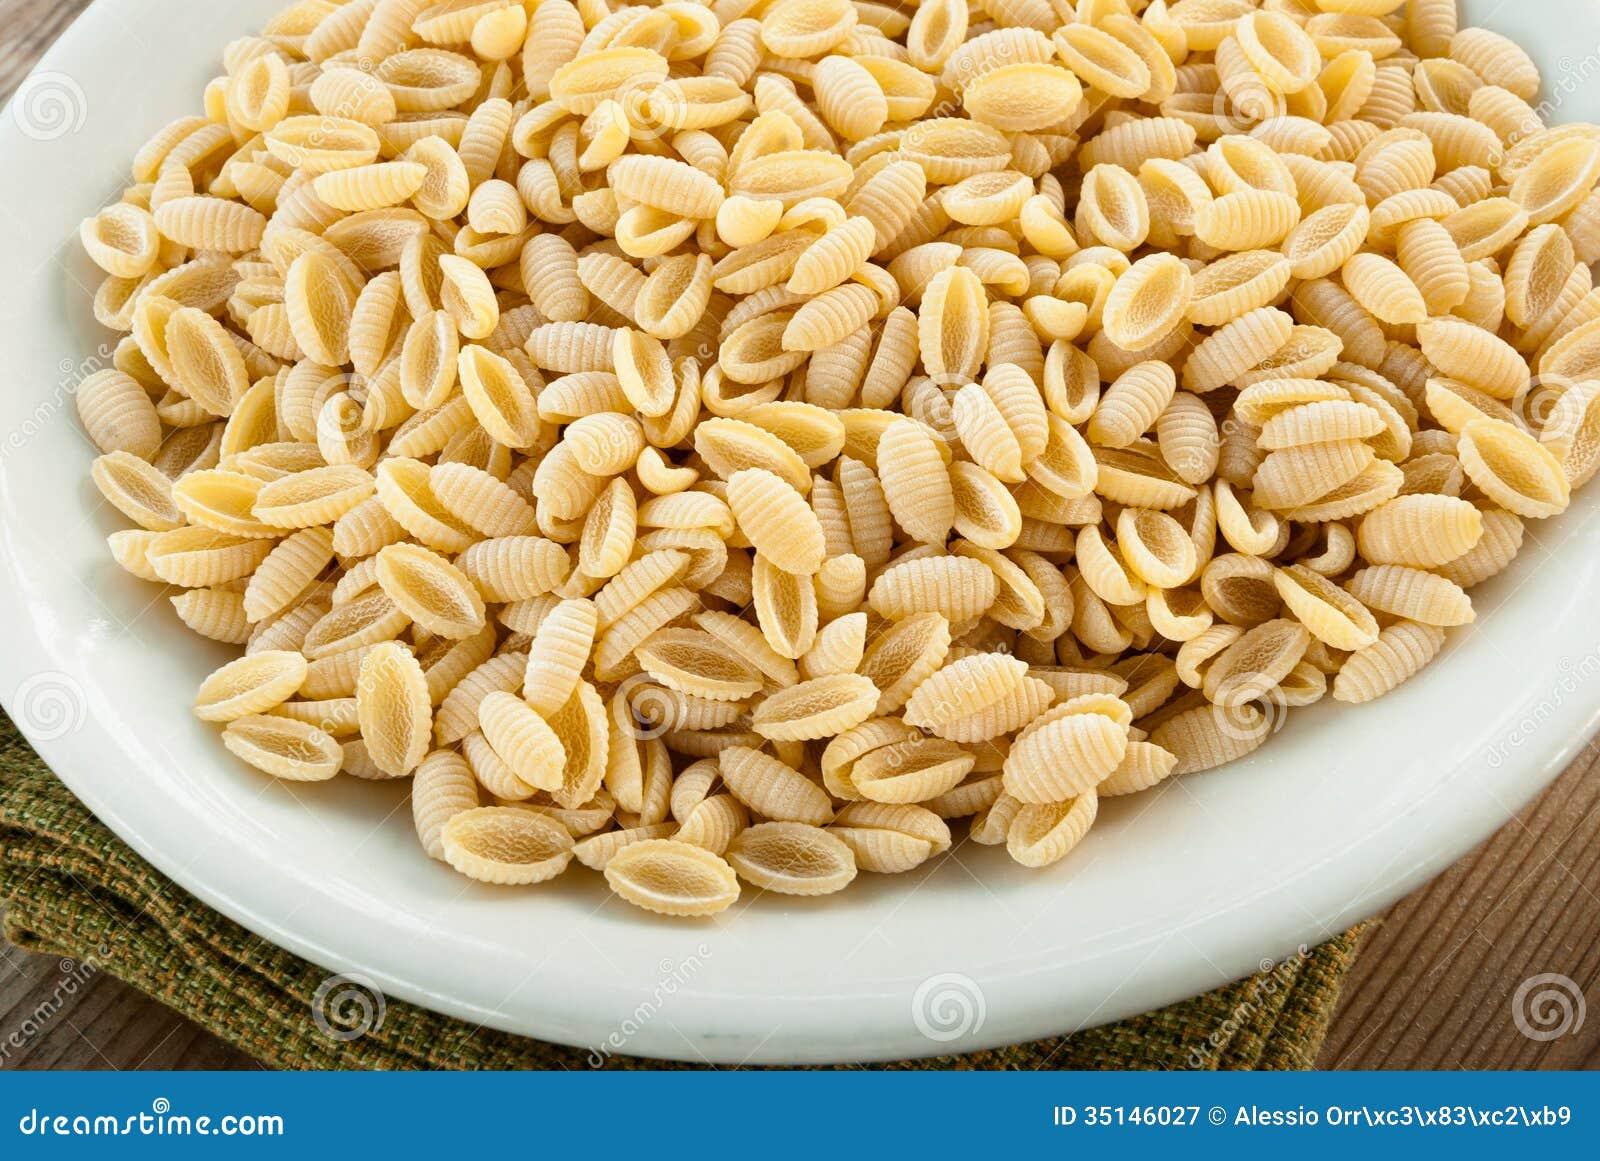 Malloreddus Cucina Sarda Fotografia Stock Libera Da Diritti  #B68515 1300 960 Immagini Di Cucina Italiana